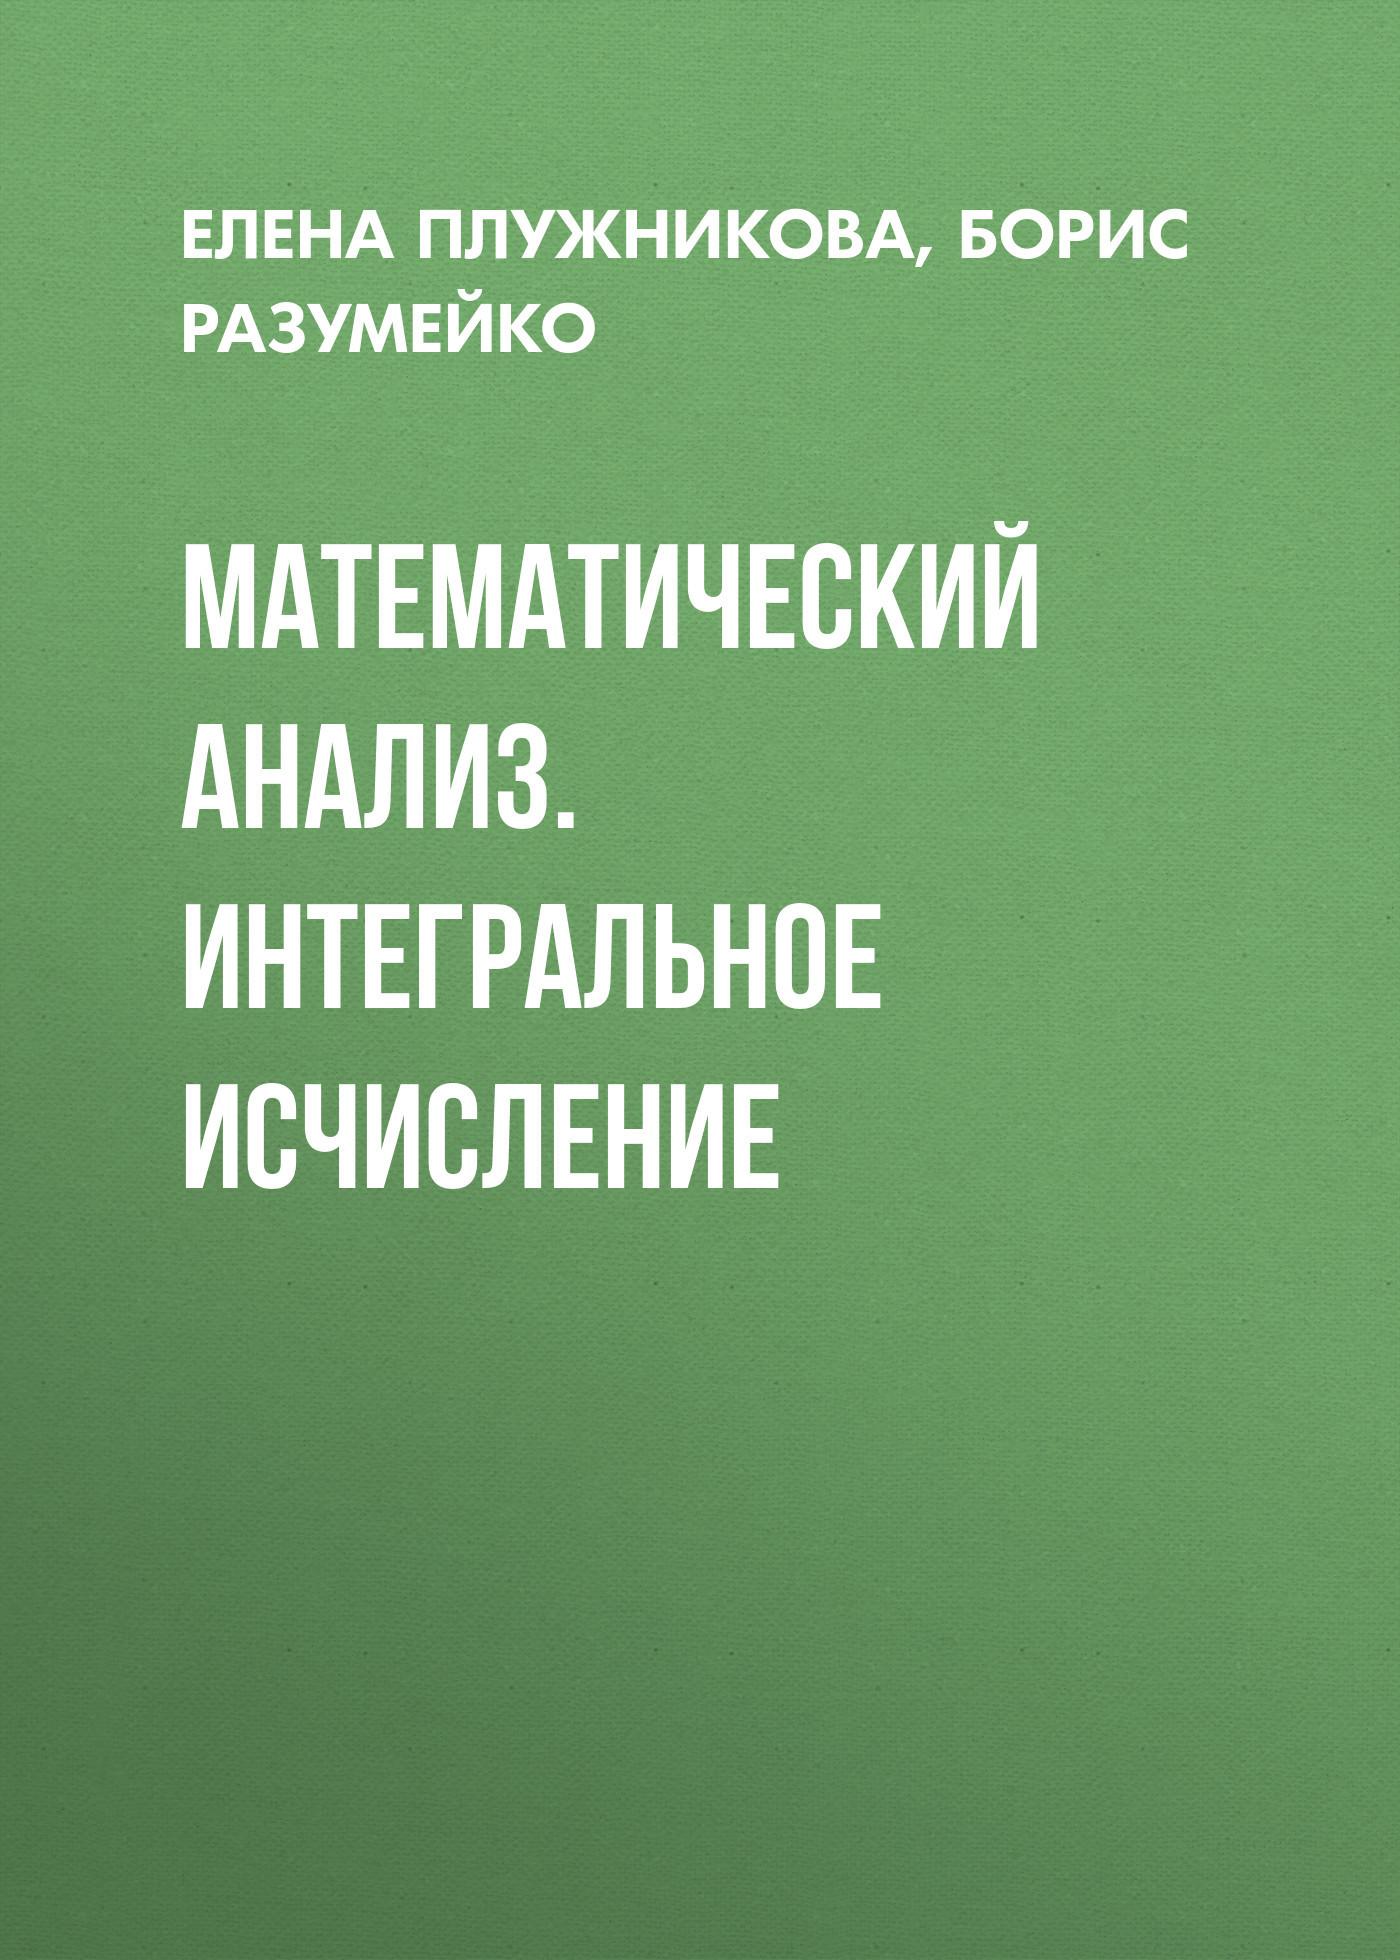 Елена Плужникова бесплатно